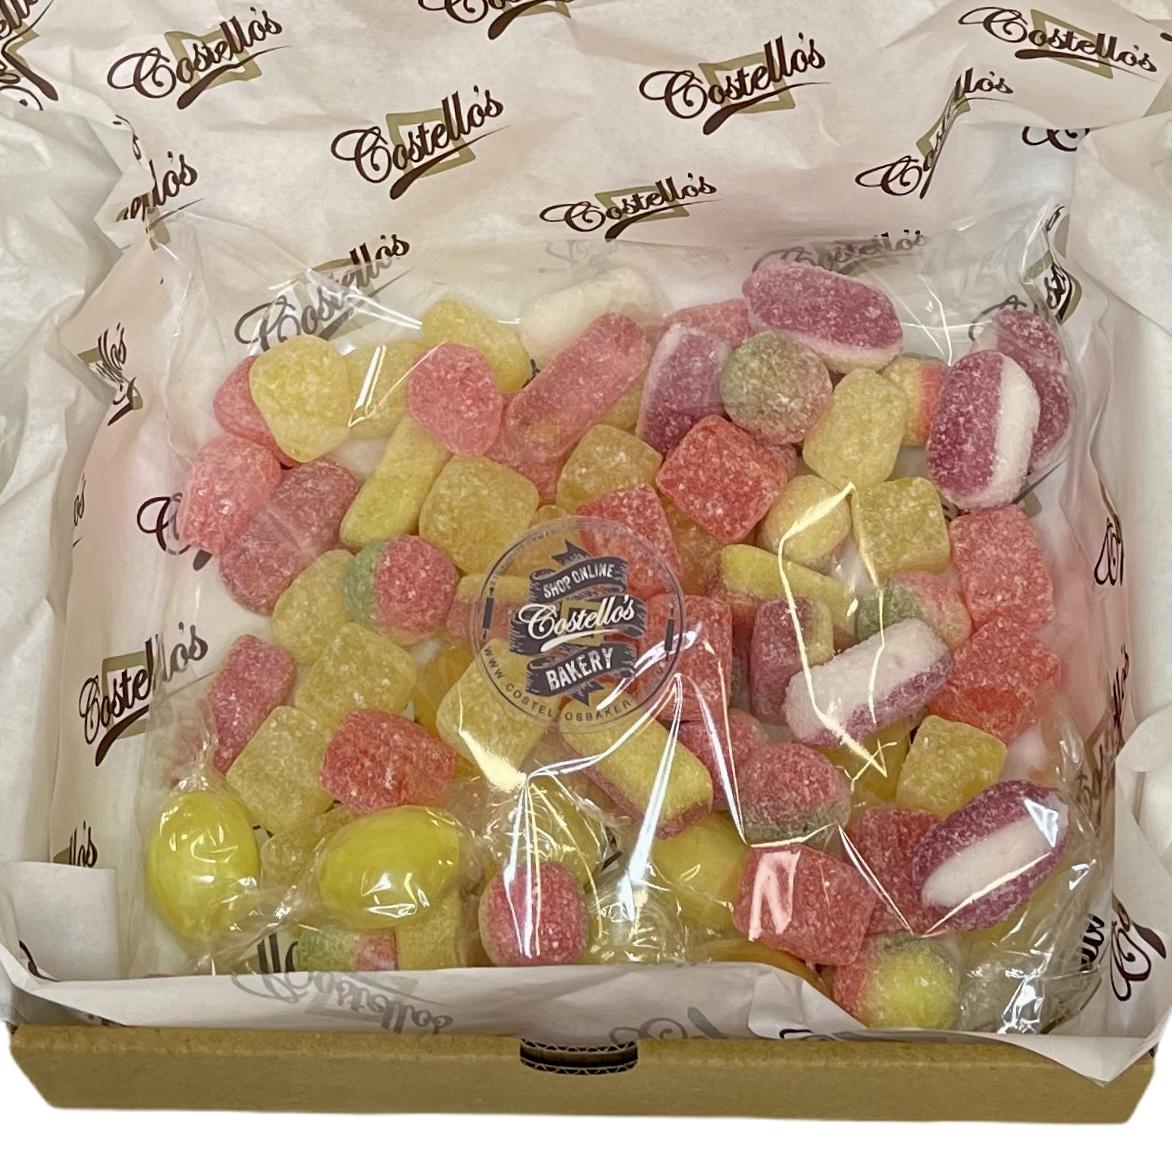 Sweets Treat Box - Hard boiled